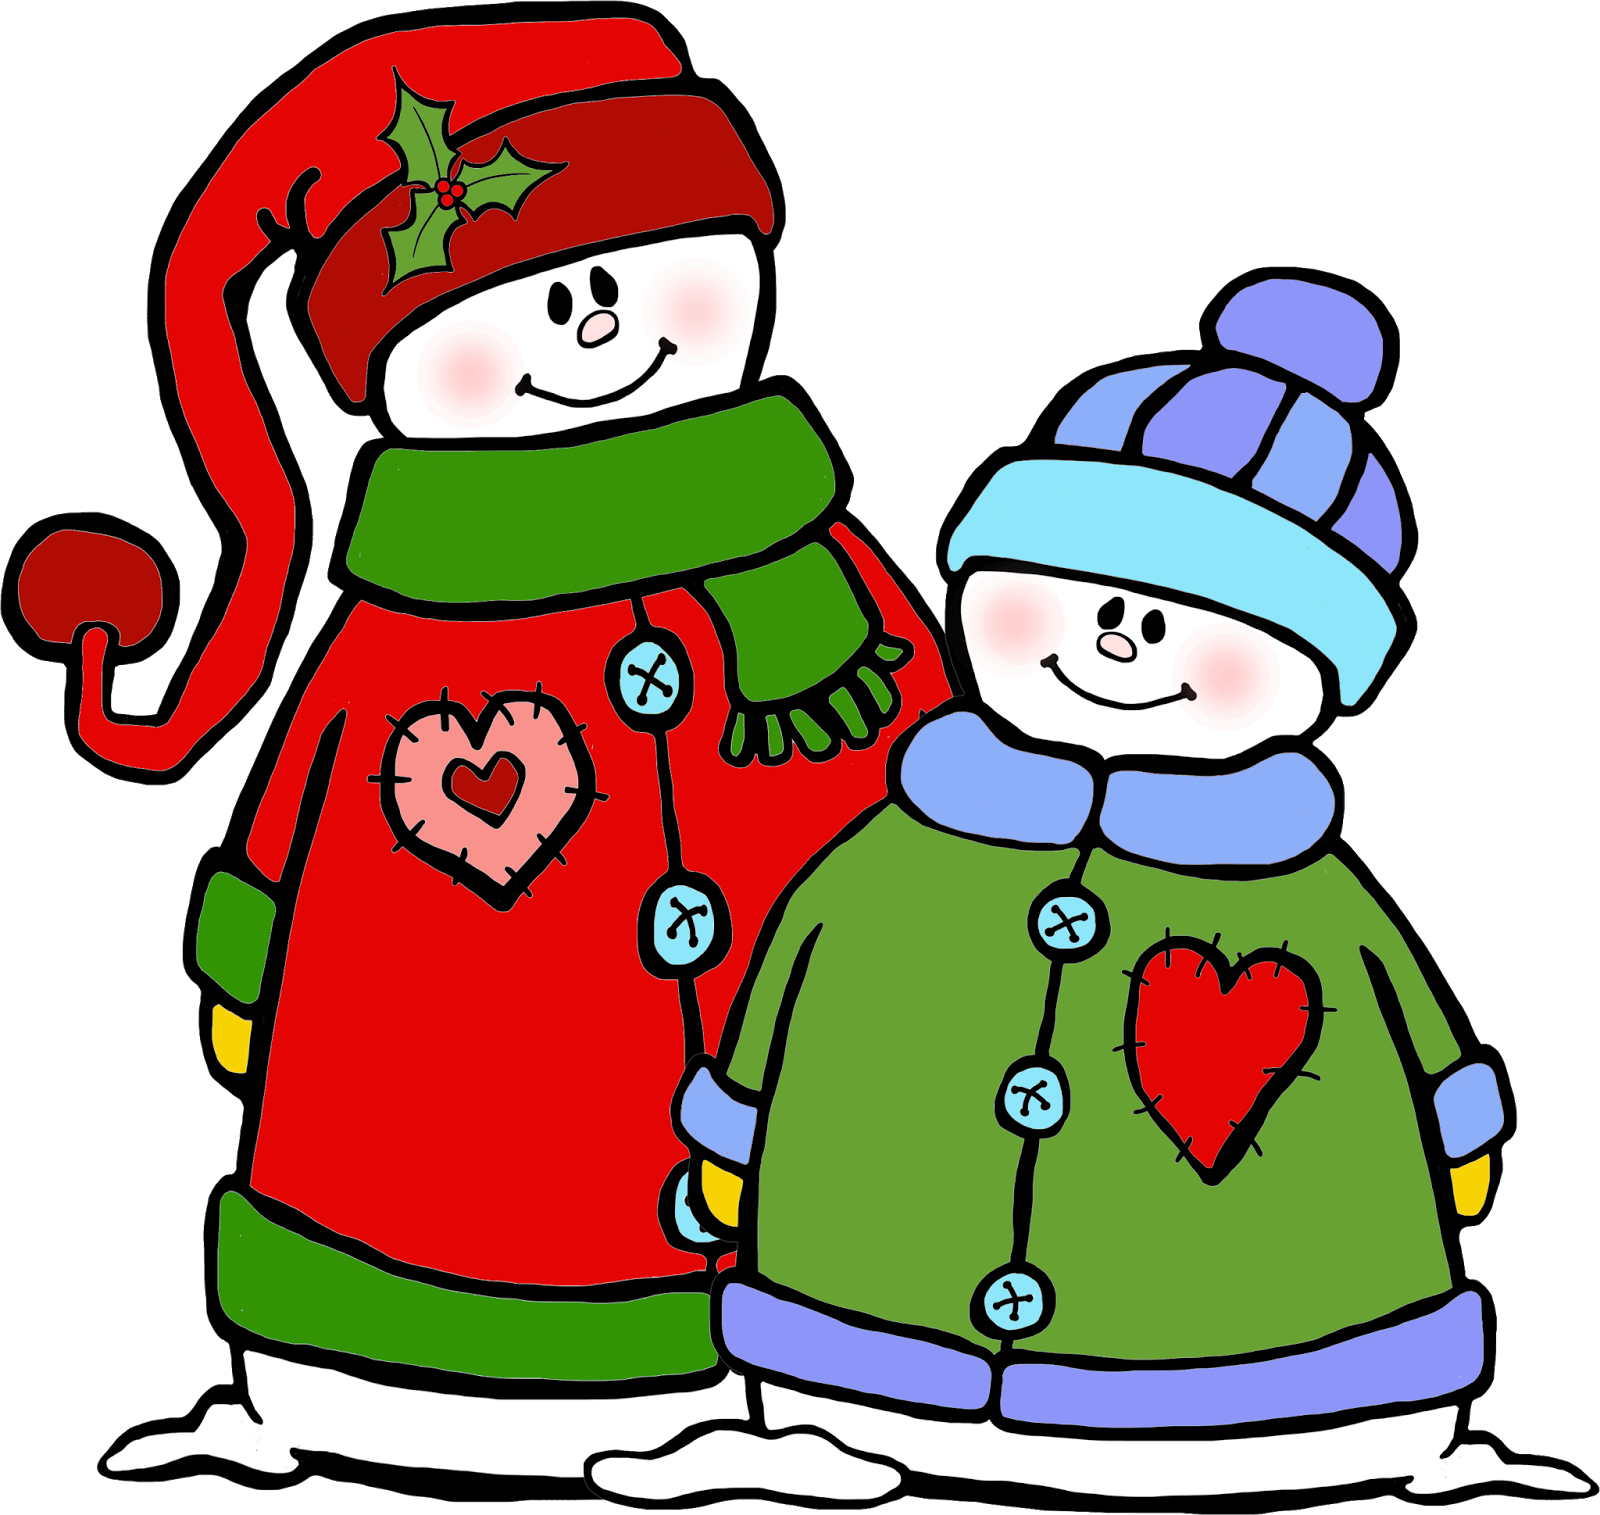 Whimsical pumpkin clipart clip art freeuse download Free Santa S Workshop Clipart, Download Free Clip Art, Free Clip Art ... clip art freeuse download